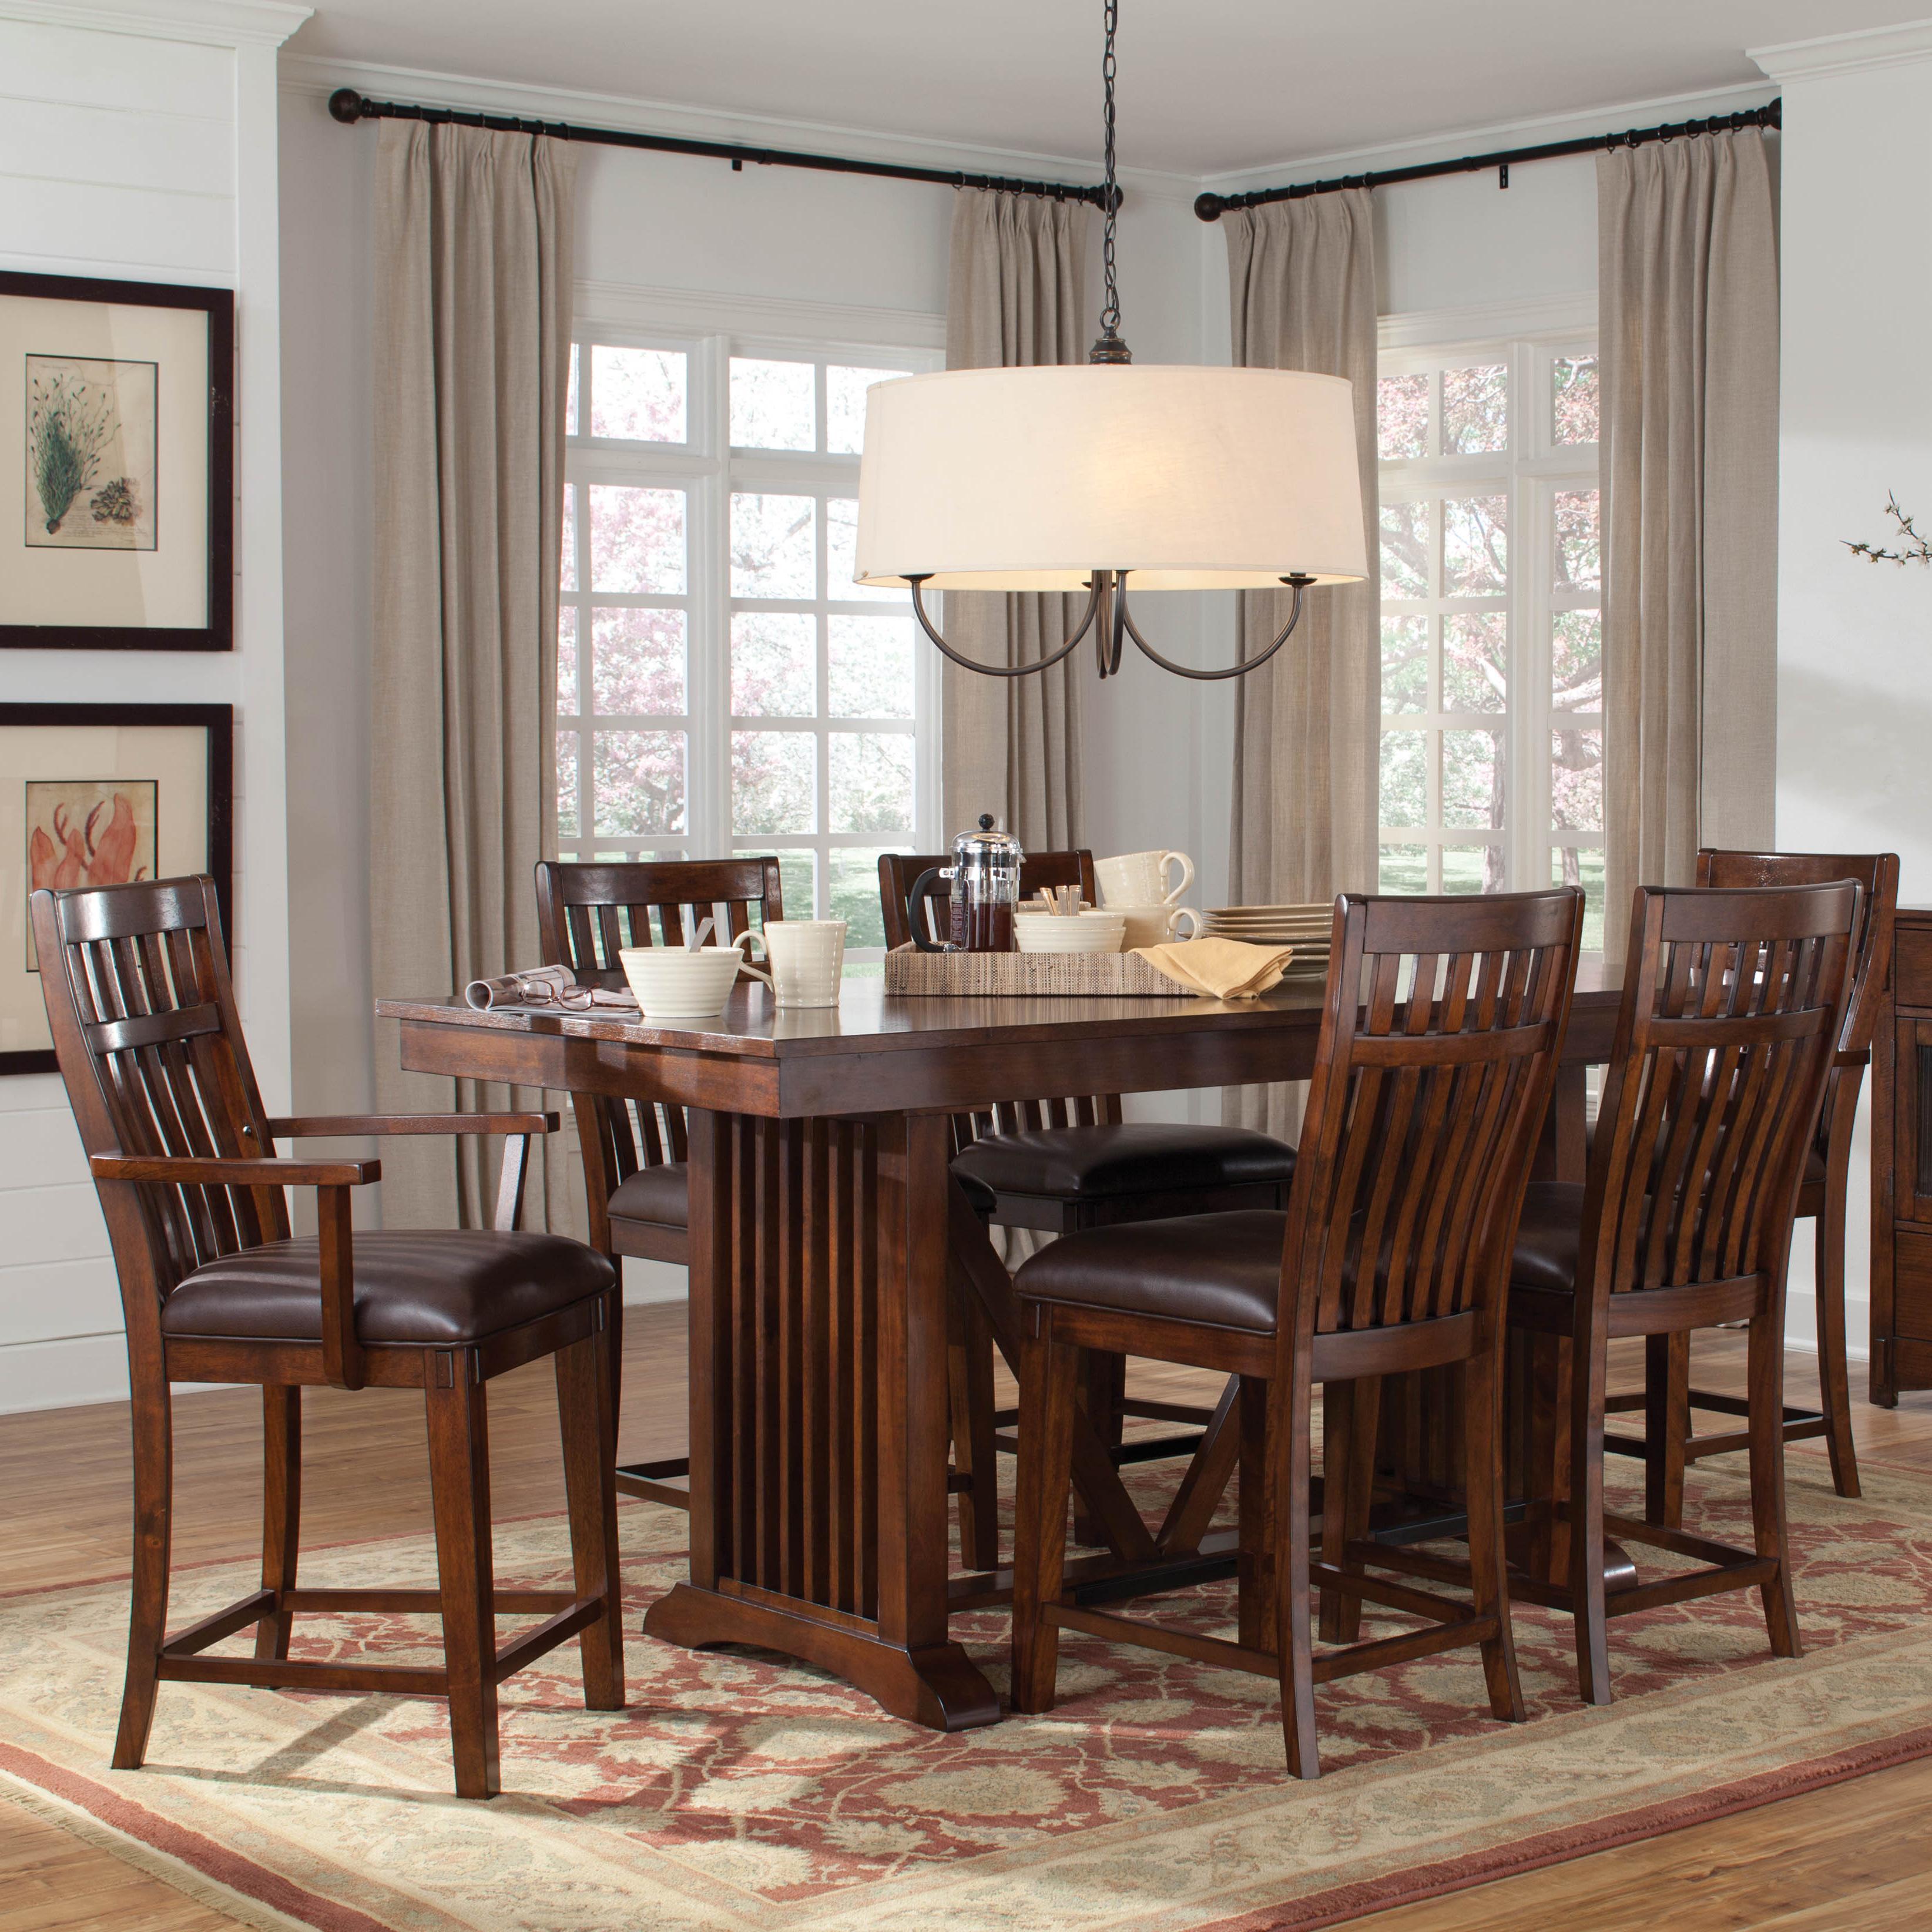 Standard Furniture Artisan Loft 7 Piece Counter Height Set - Item Number: 13636+2x39+4x34